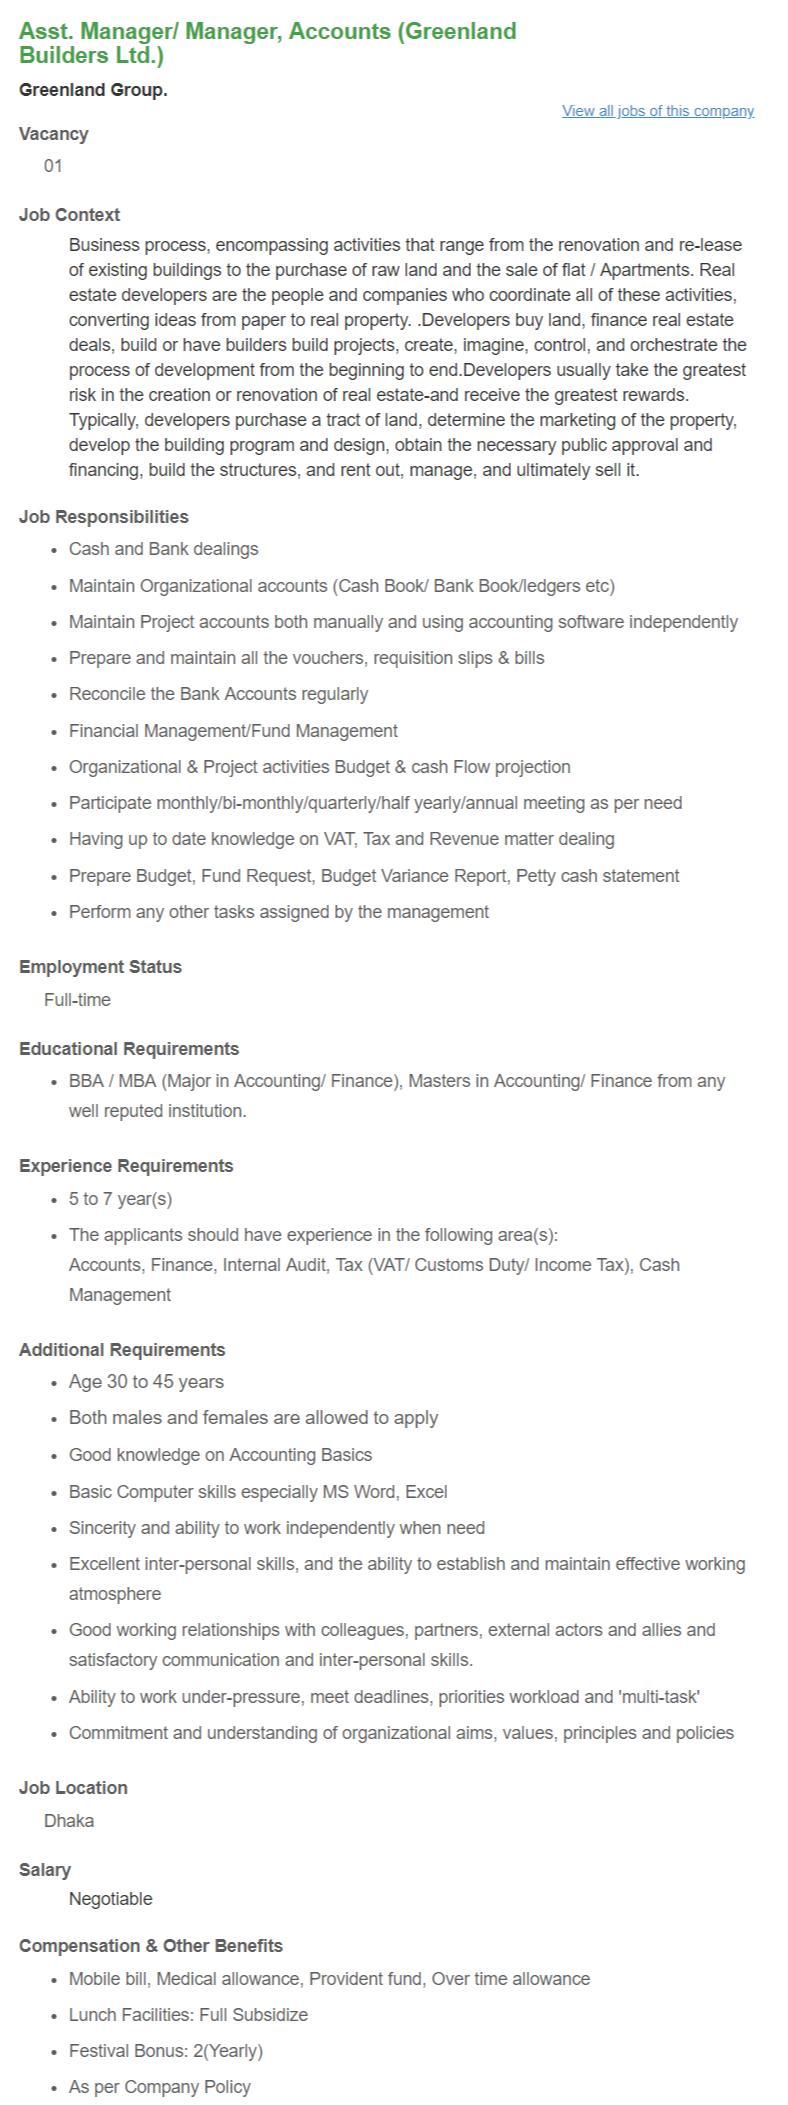 Asst Manager_ Manager, Accounts (Greenland Builders Ltd.) _ Greenland Group. __ Bdjobs.com